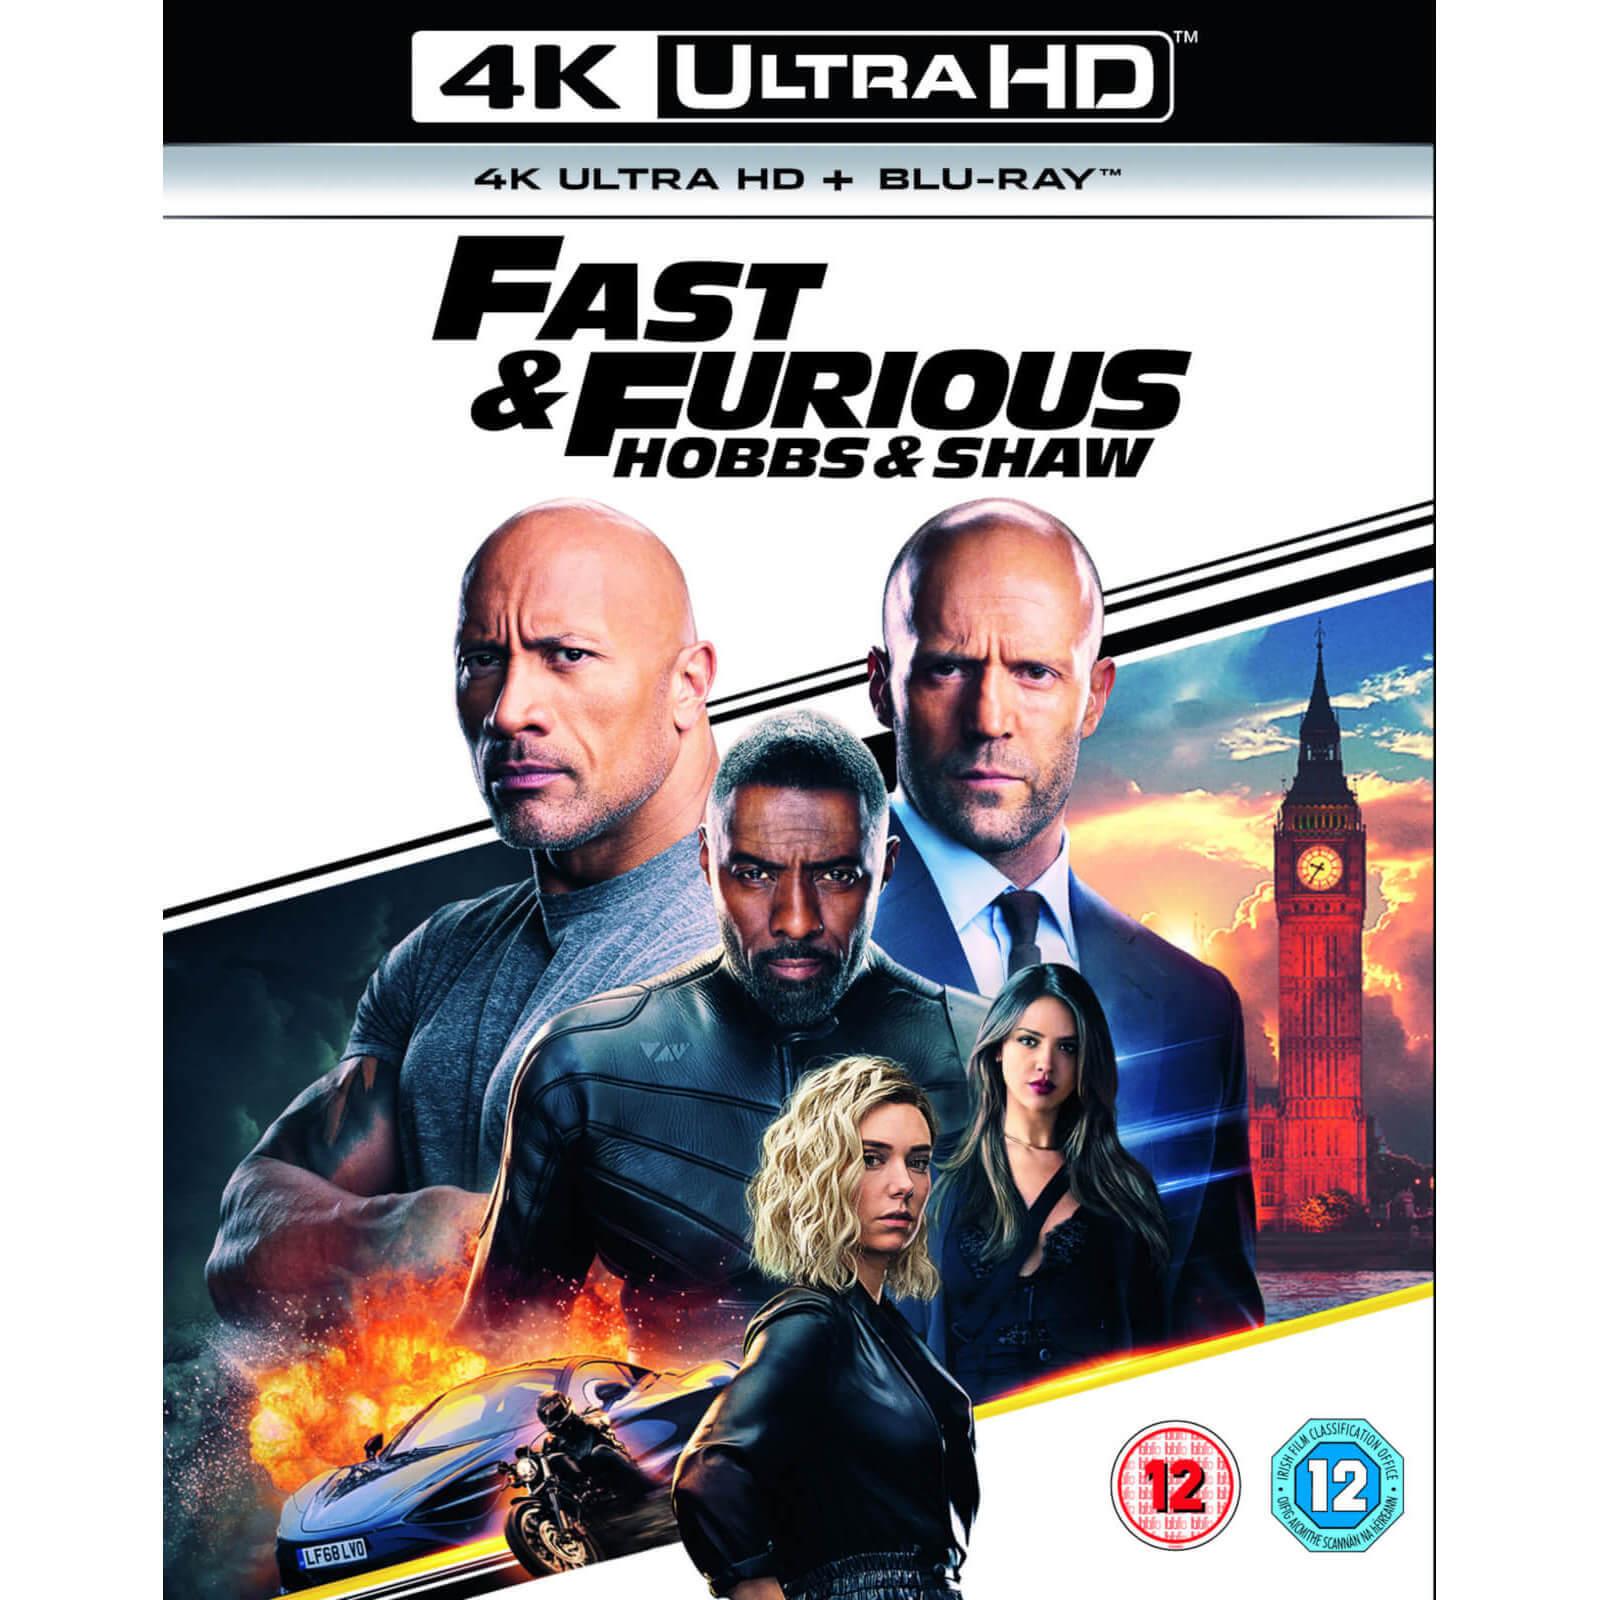 fast & furious presents: hobbs & shaw - 4k ultra hd